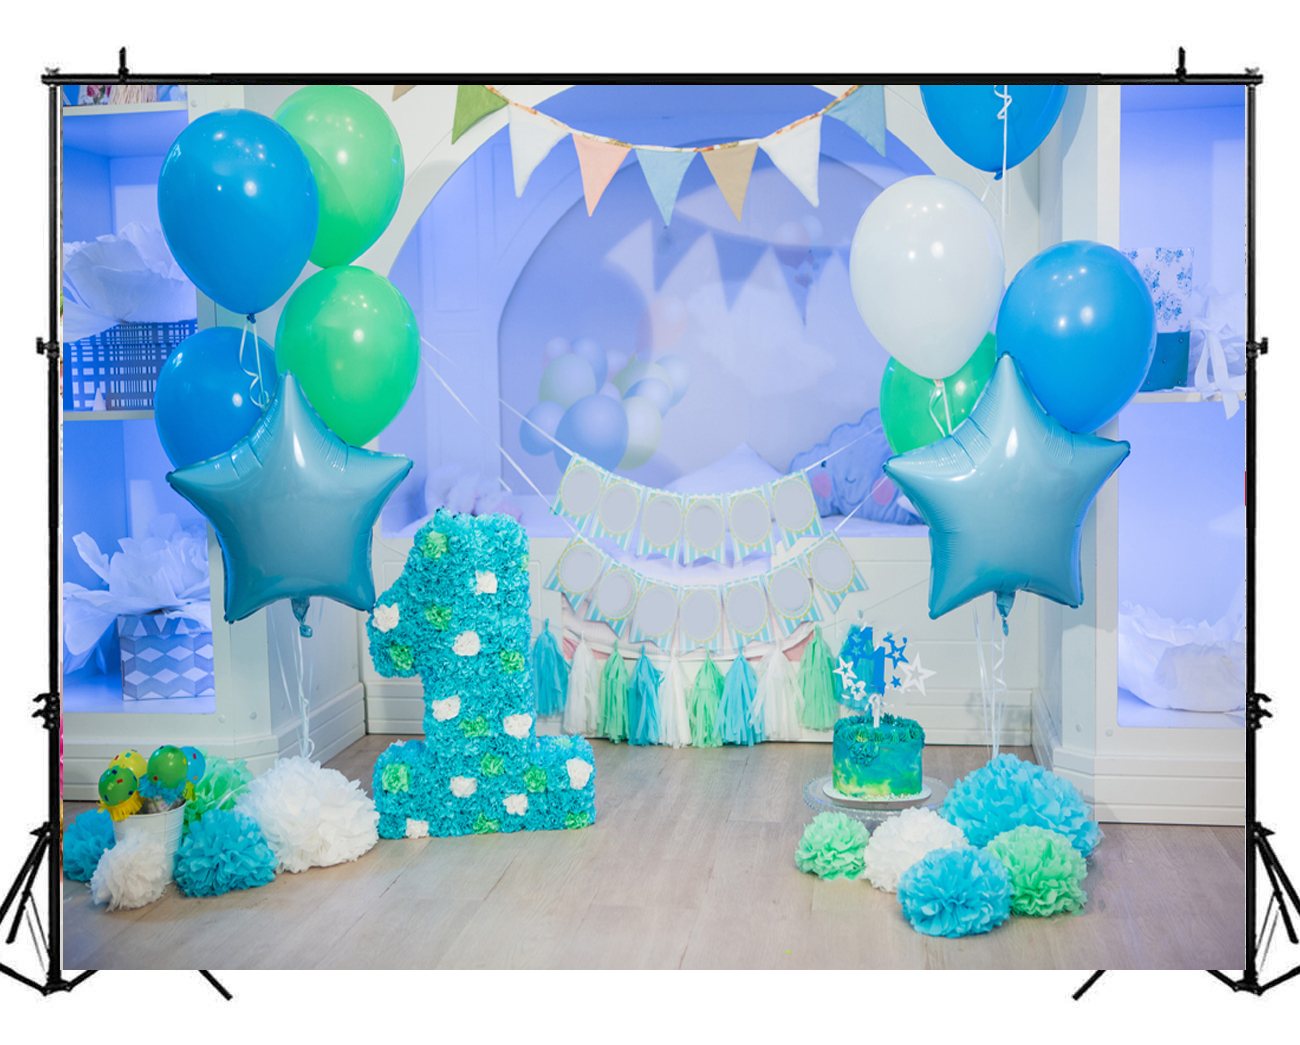 Blue Gold Baby Boy 1st Birthday Party Decorations Cake Smash Kit Photo Backdrop